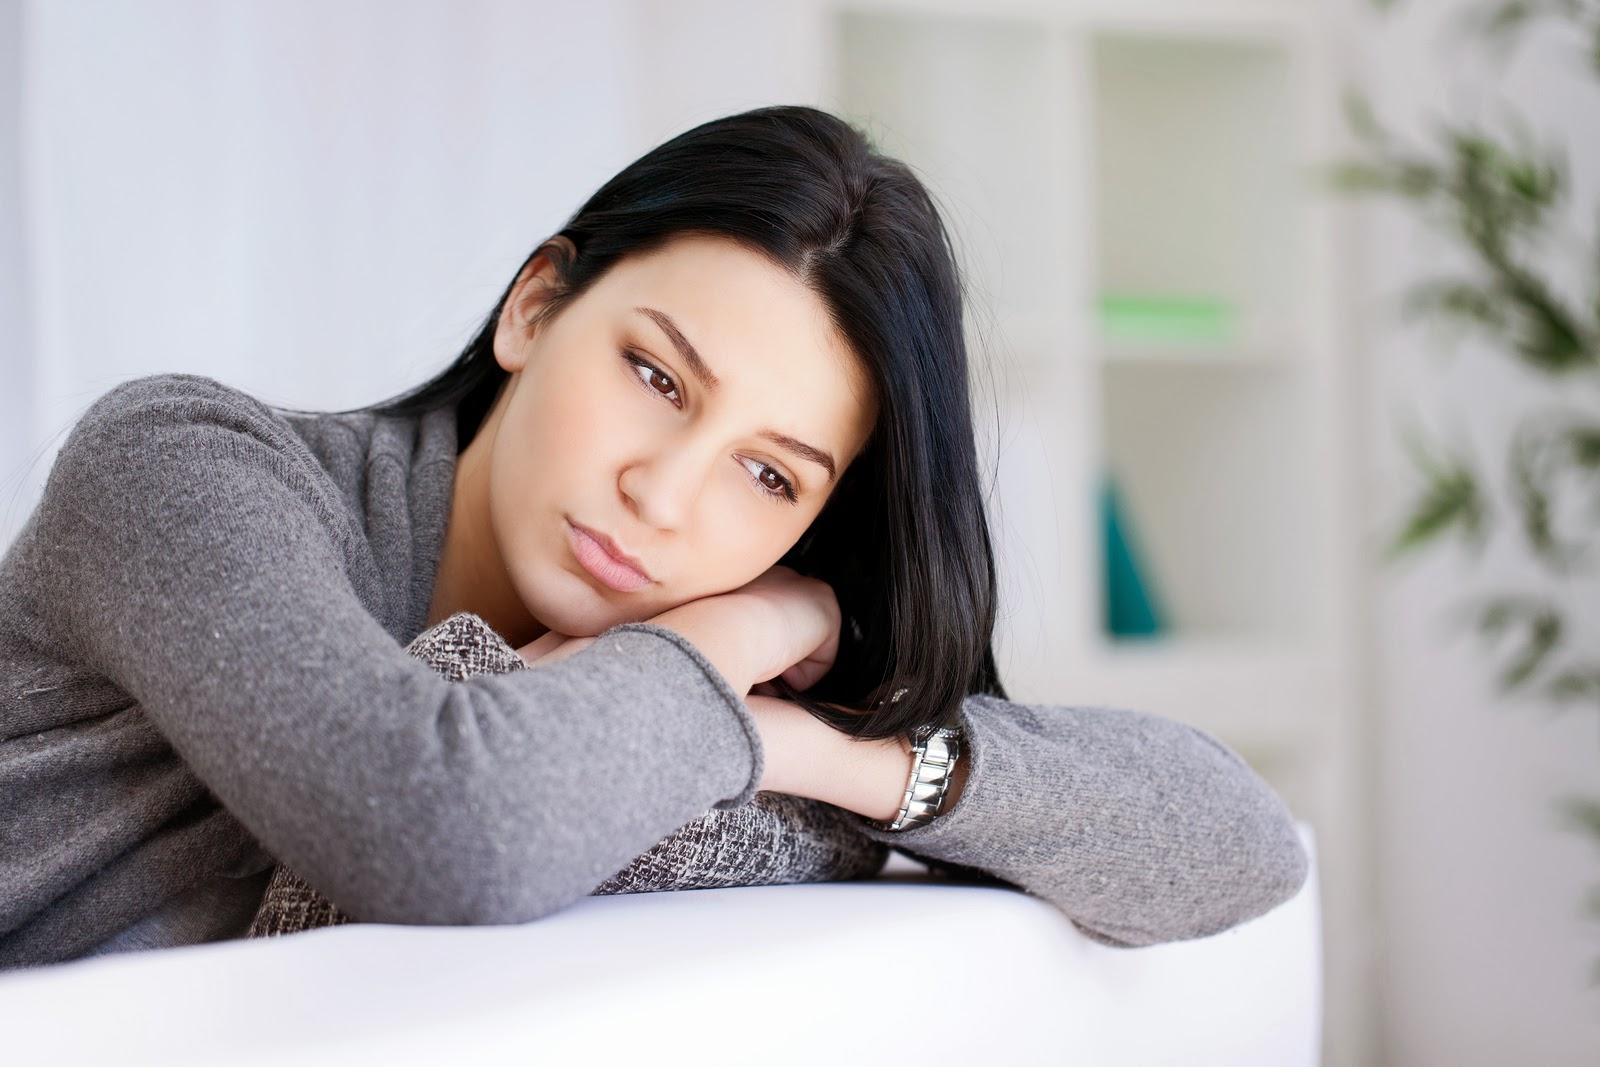 lonely-sad-woman